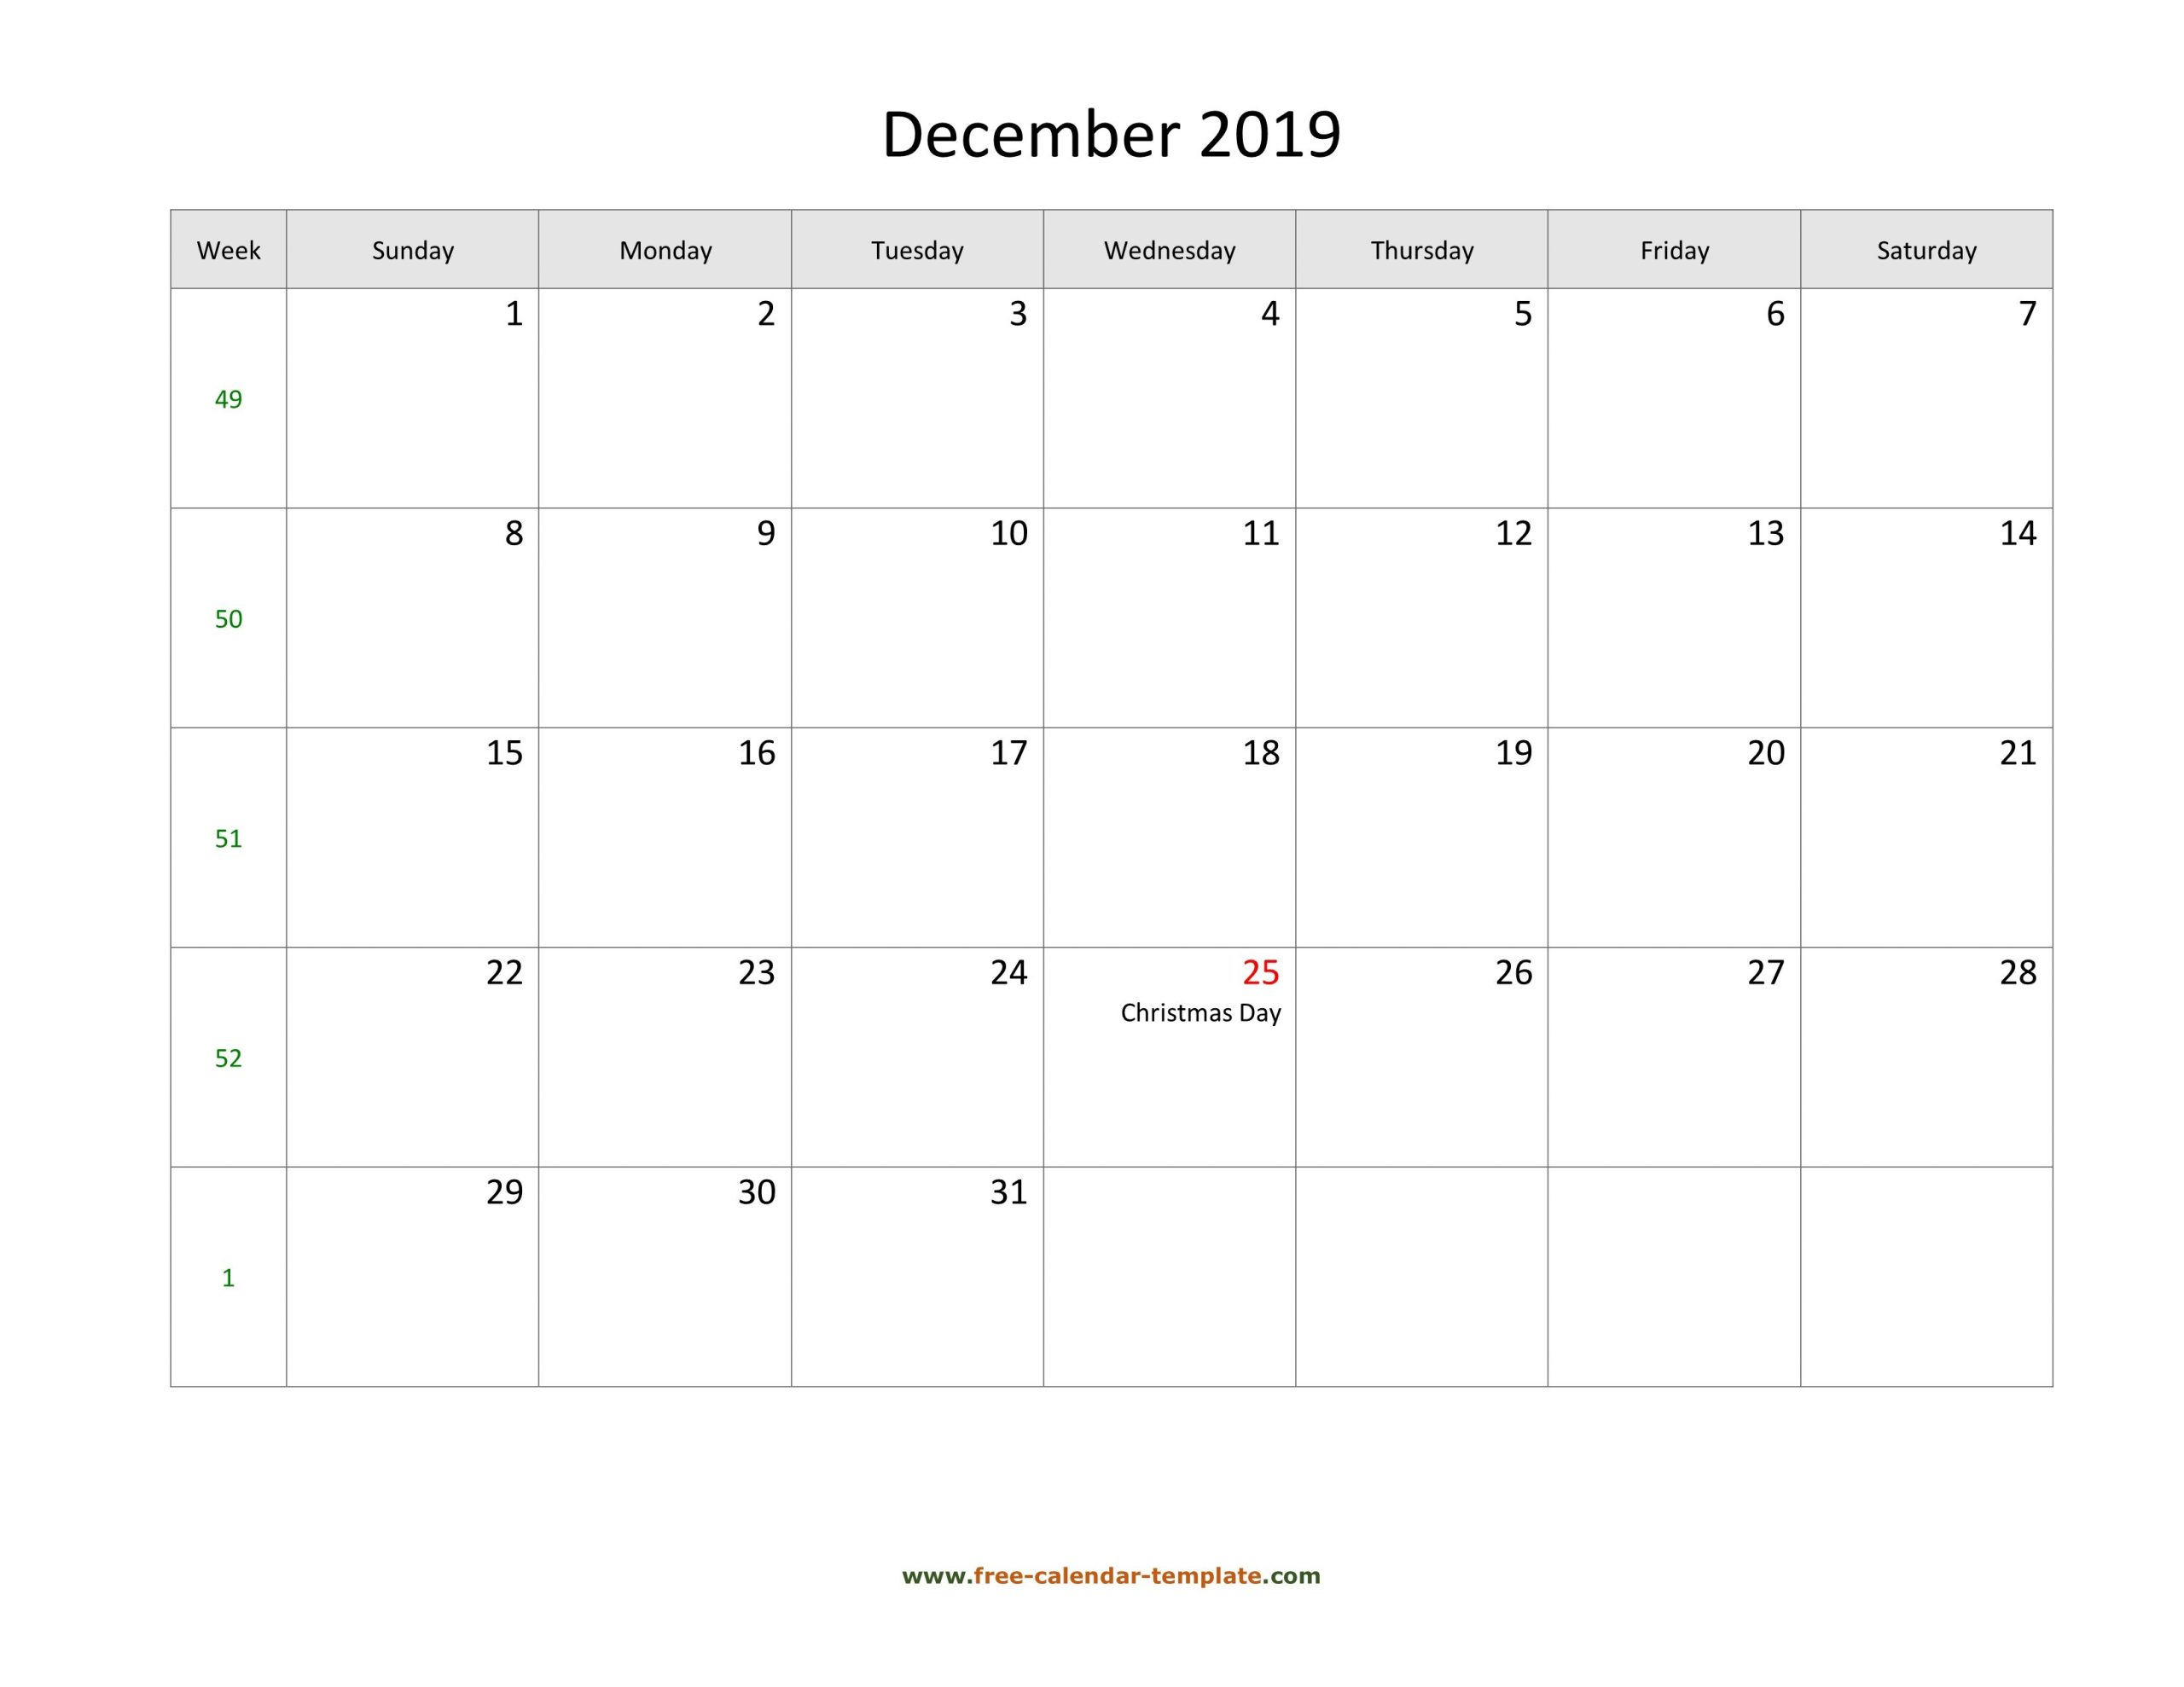 Free Printable Calendar You Can Edit | Calendar Printables Free Calendar You Can Edit